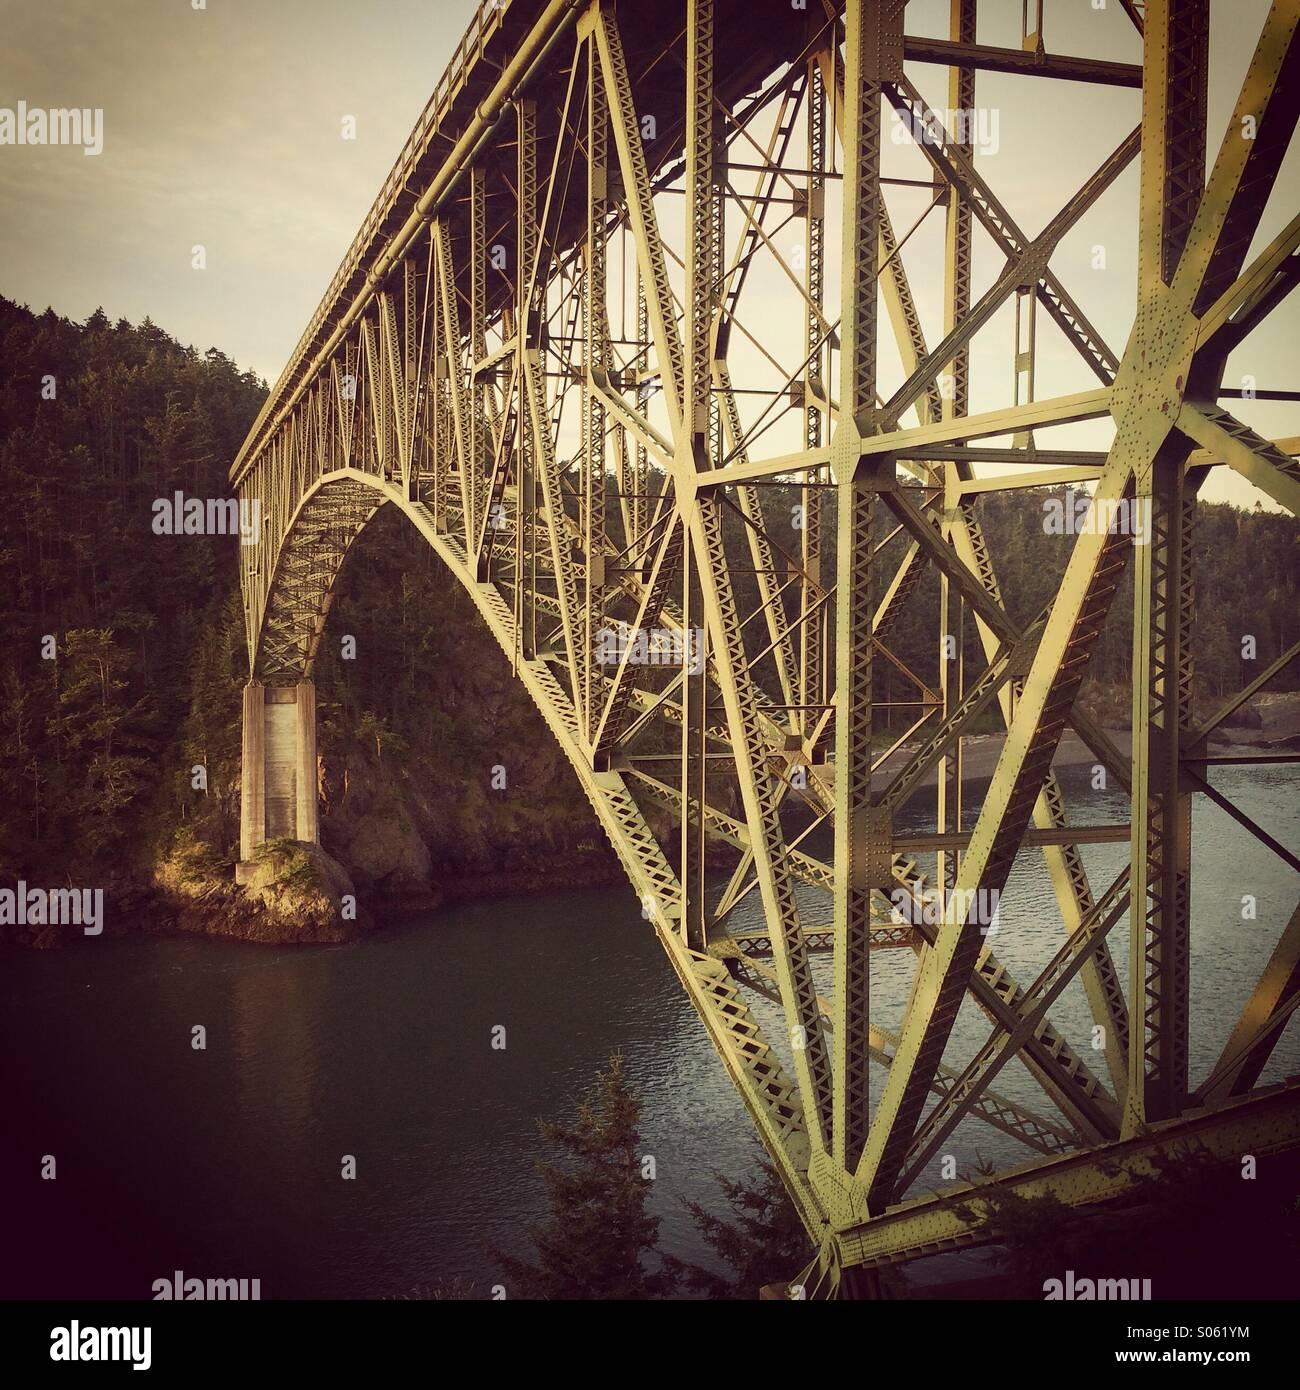 Deception Pass Bridge, Whidbey Island, Washington, - Stock Image